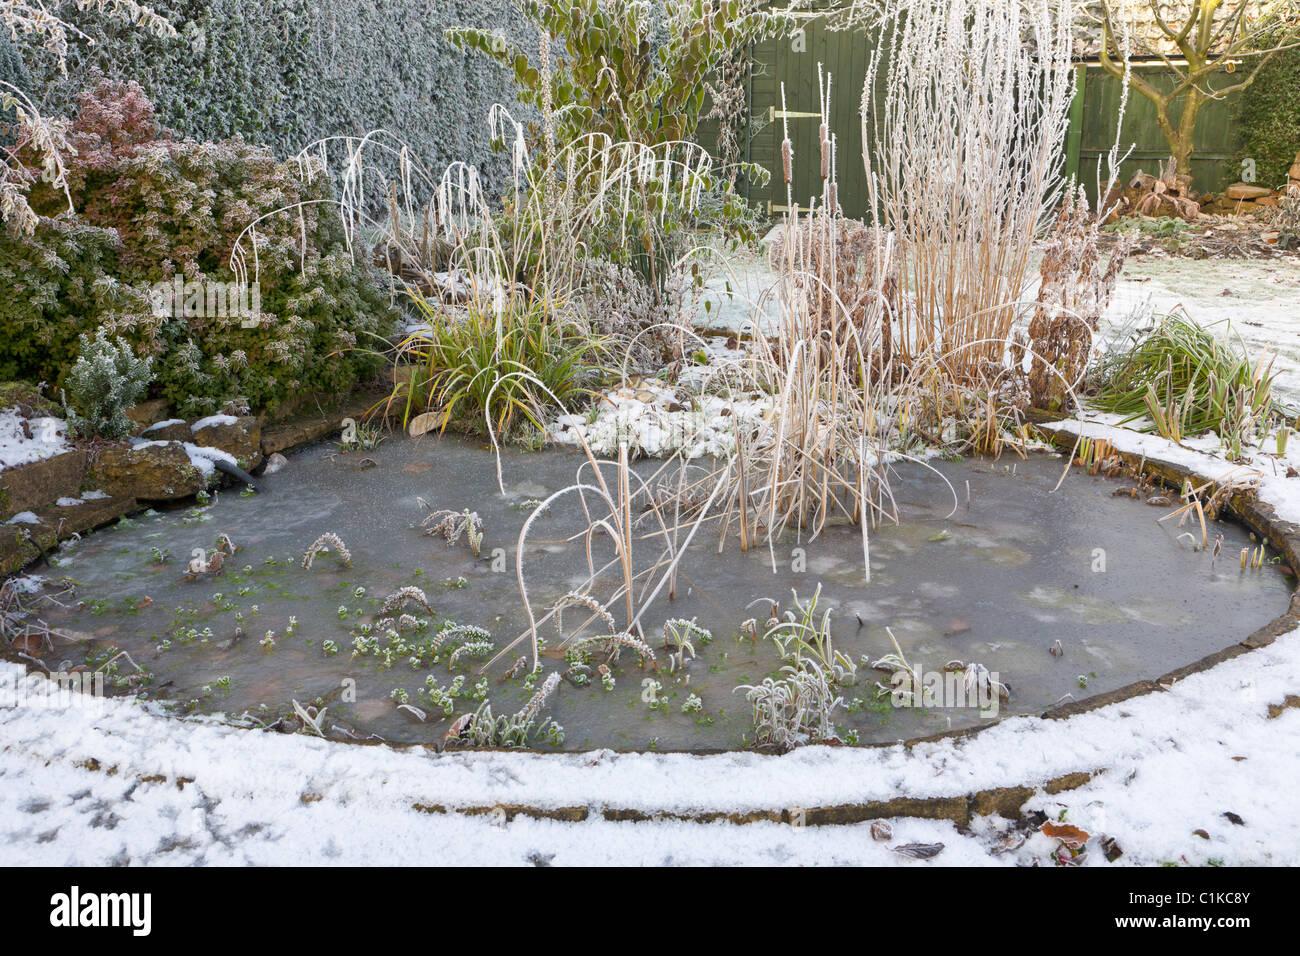 Frozen garden pond in winter stock photo royalty free for Winter garden pool